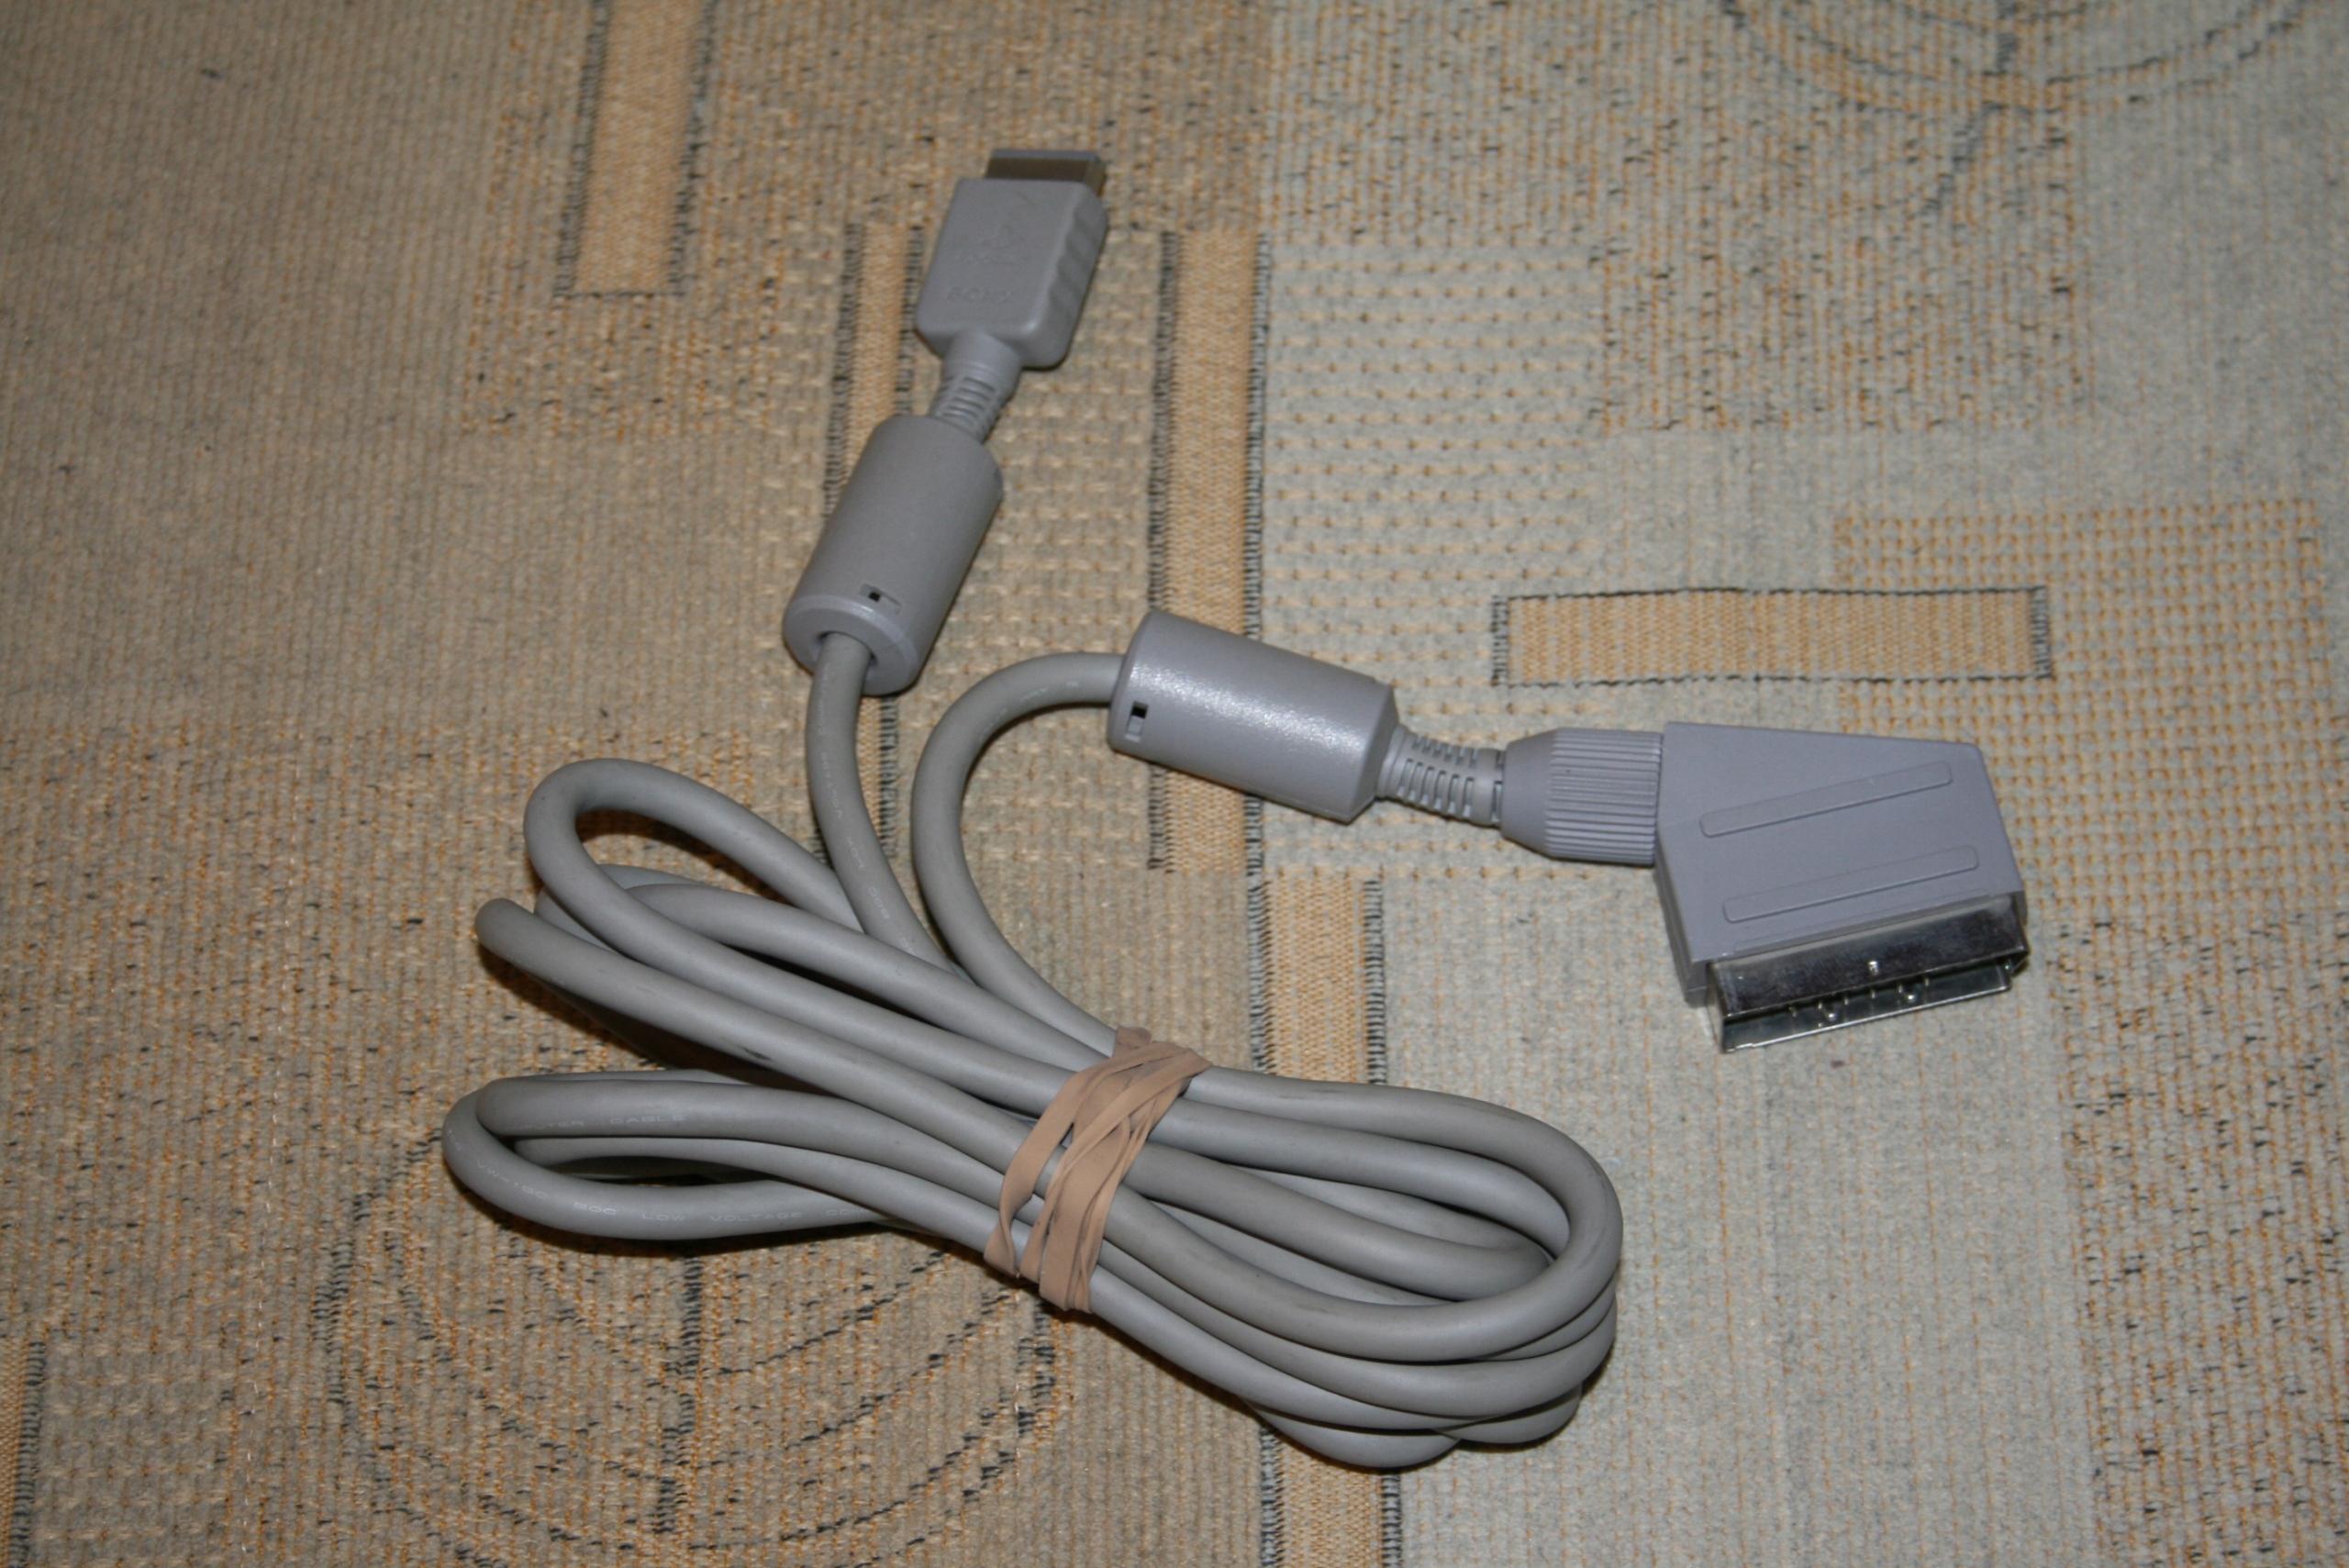 ORYGINALNY KABEL RGB SONY PLAYSTATION / SCPH-1052